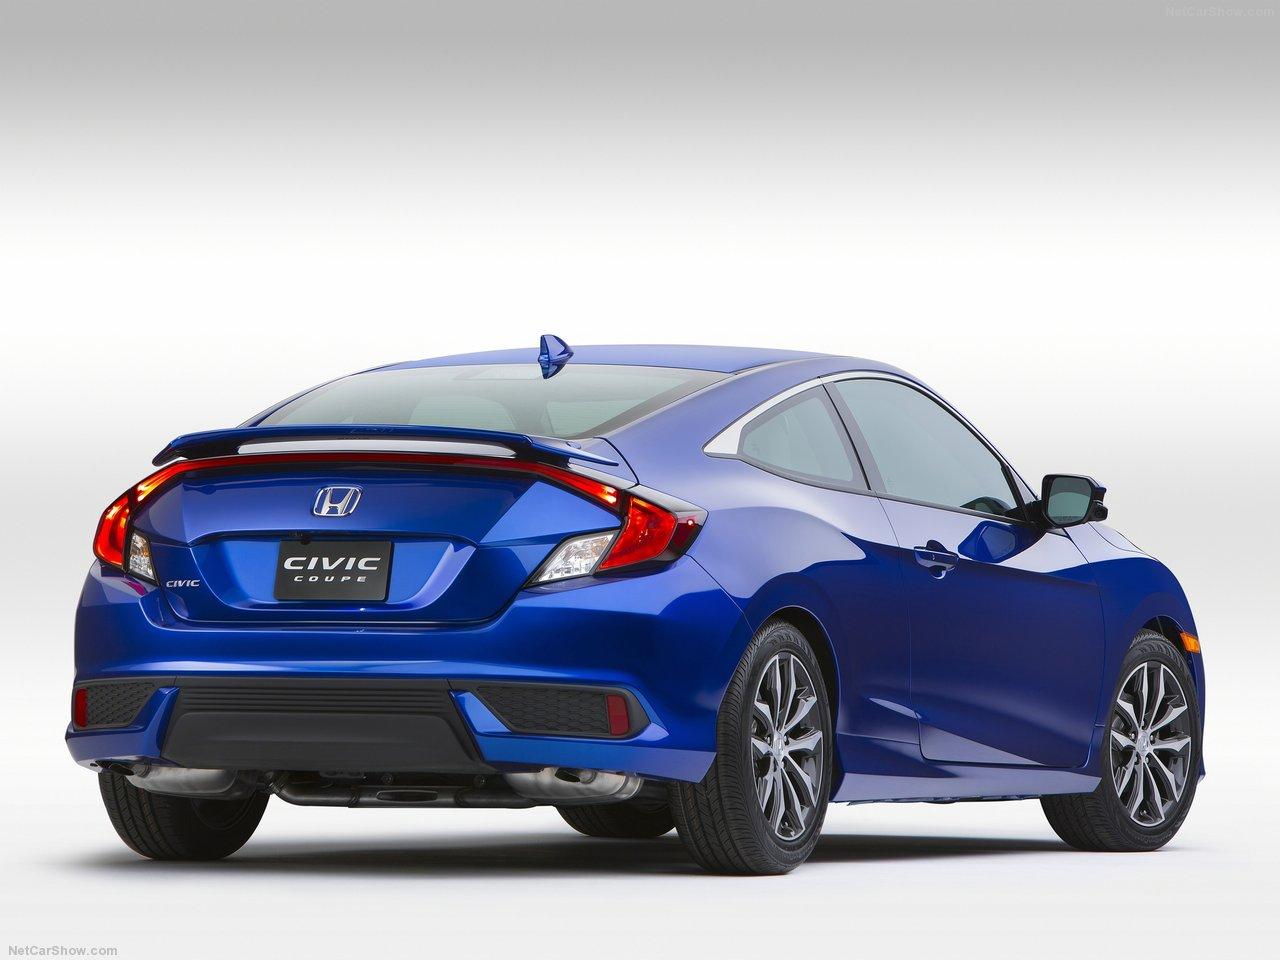 Honda-Civic_Coupe_2016_1280x960_wallpaper_04 (1)